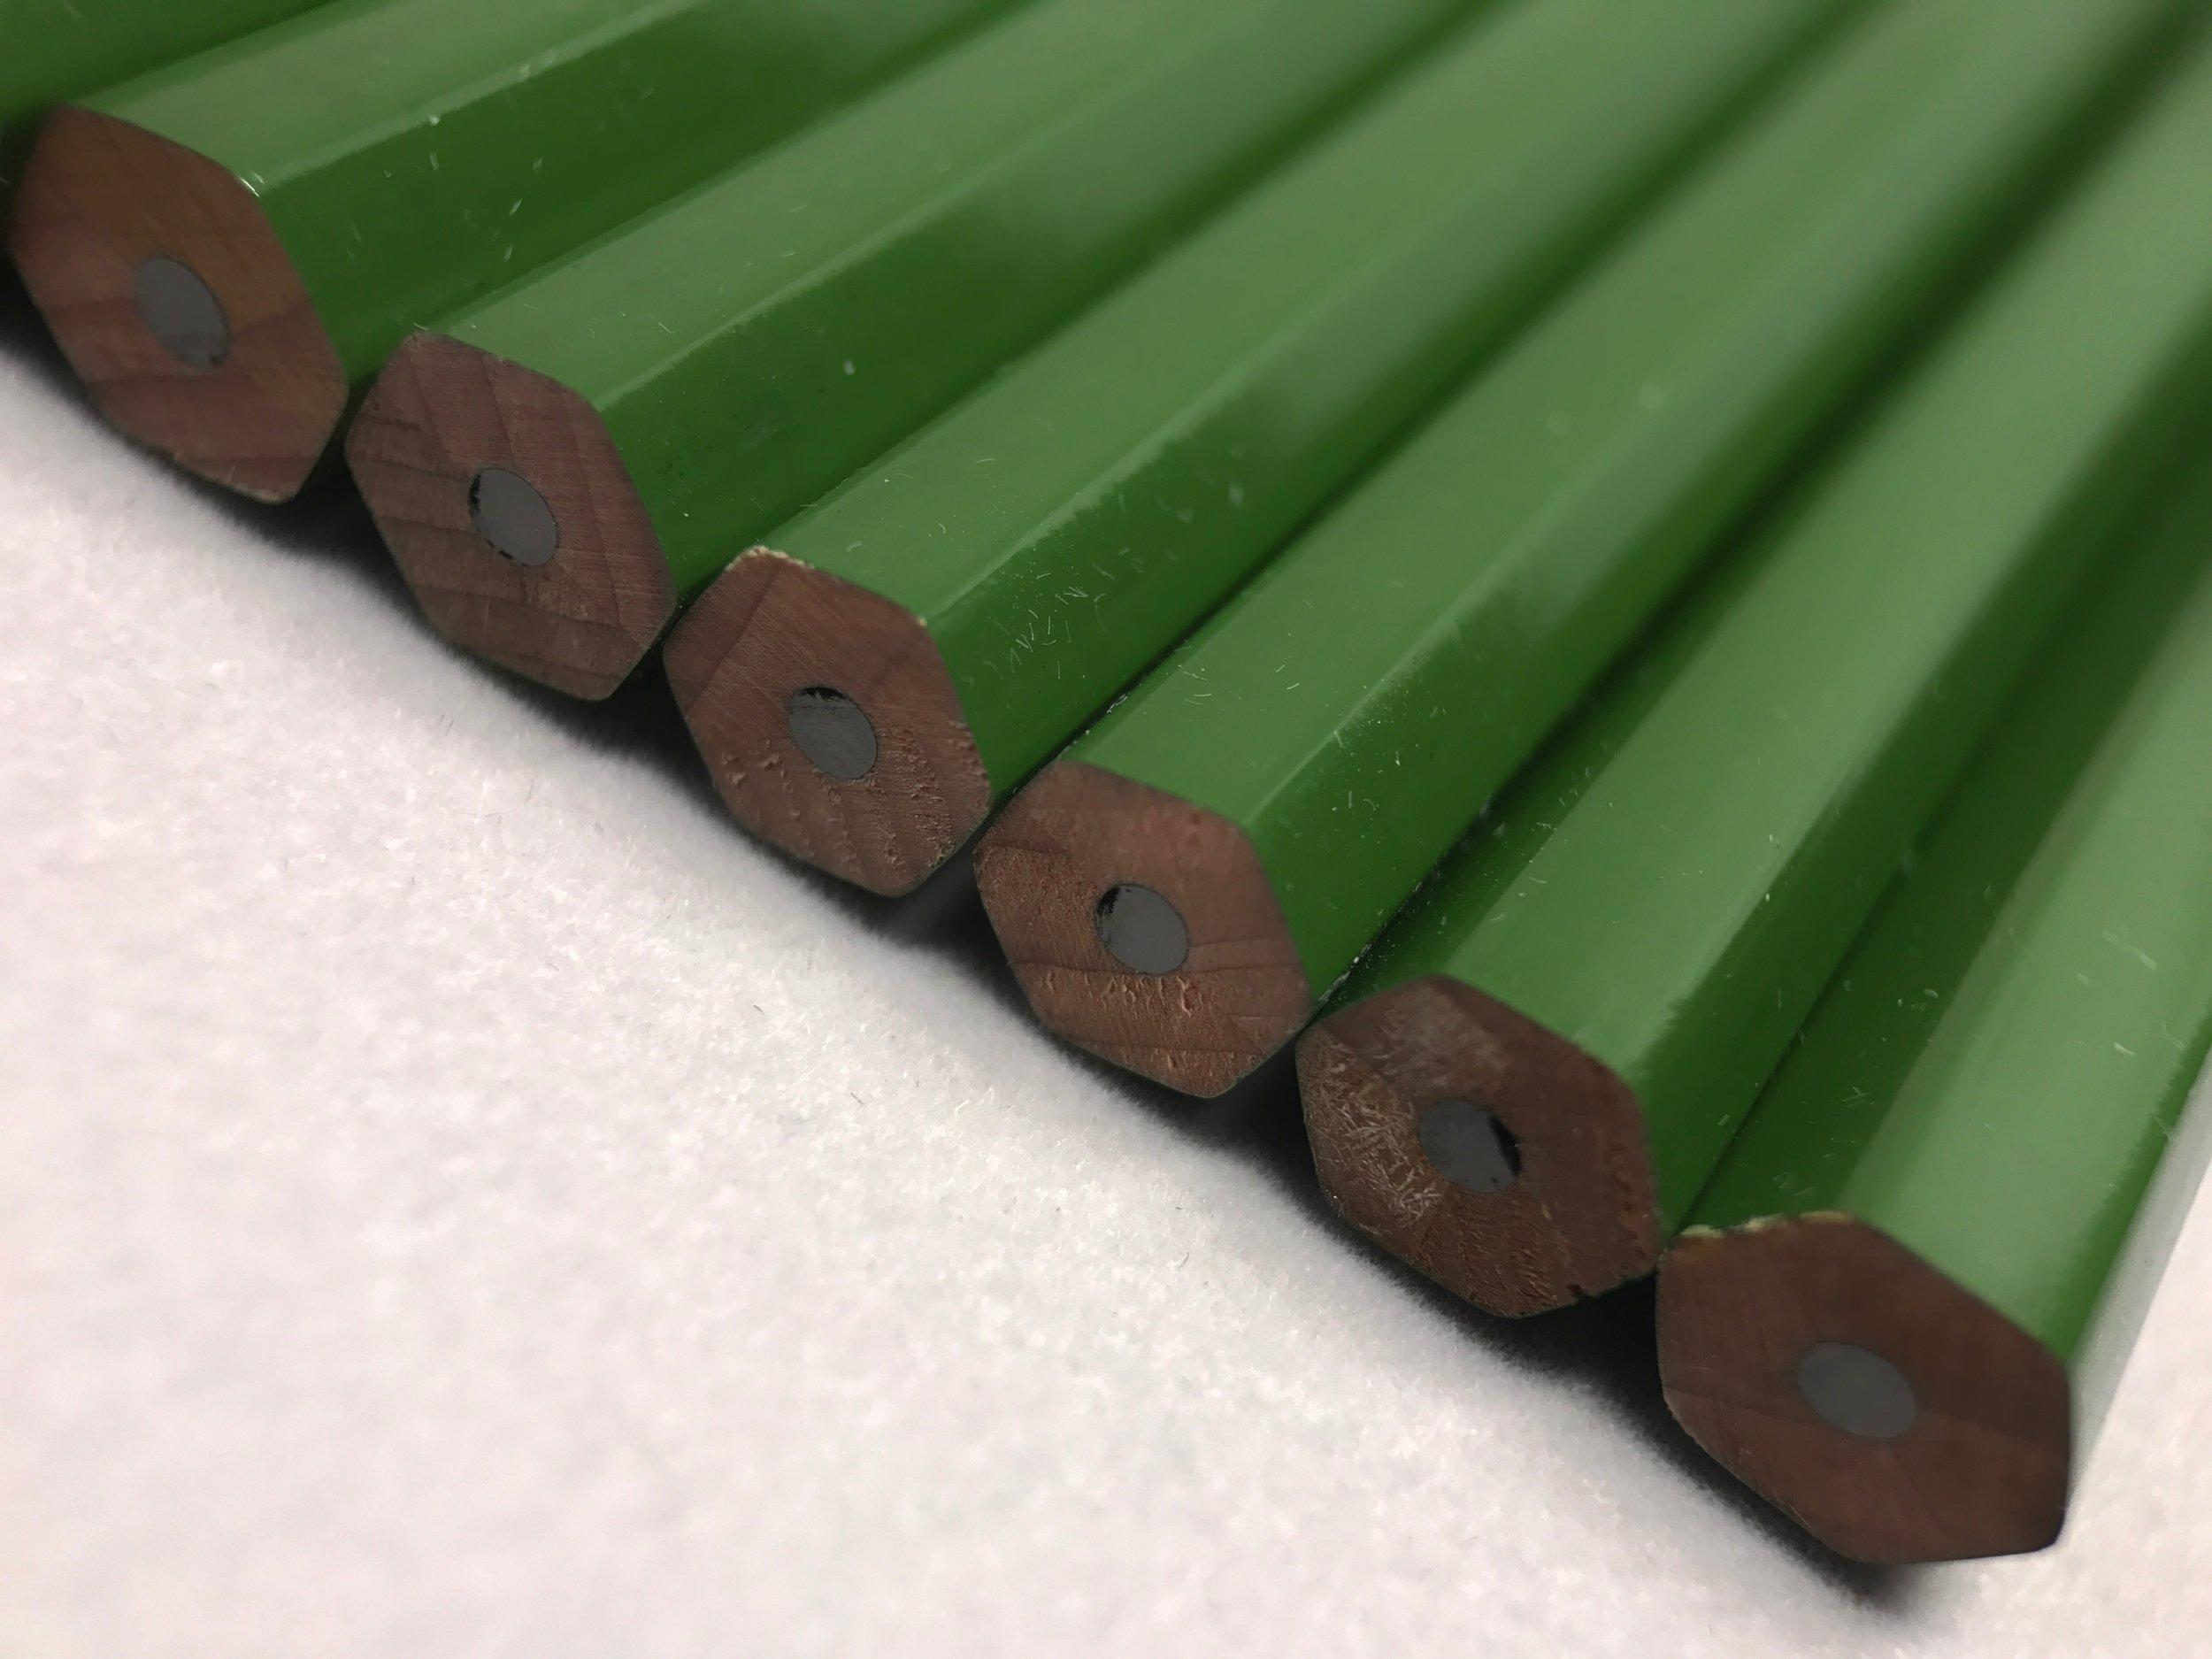 tombow-8900-pencil-10.jpg